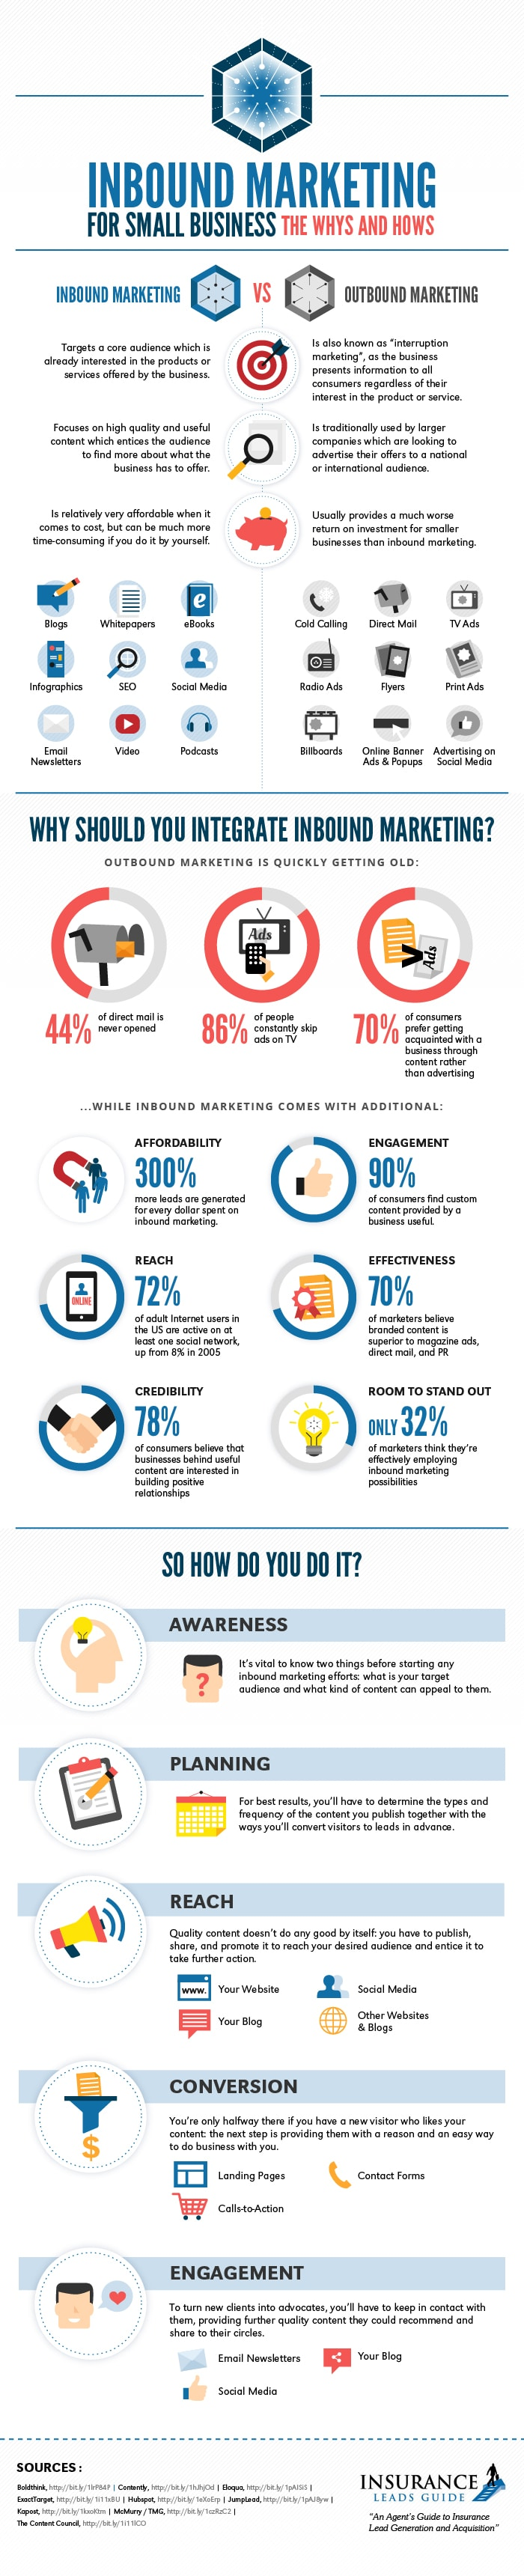 Inbound Marketing for SMBs